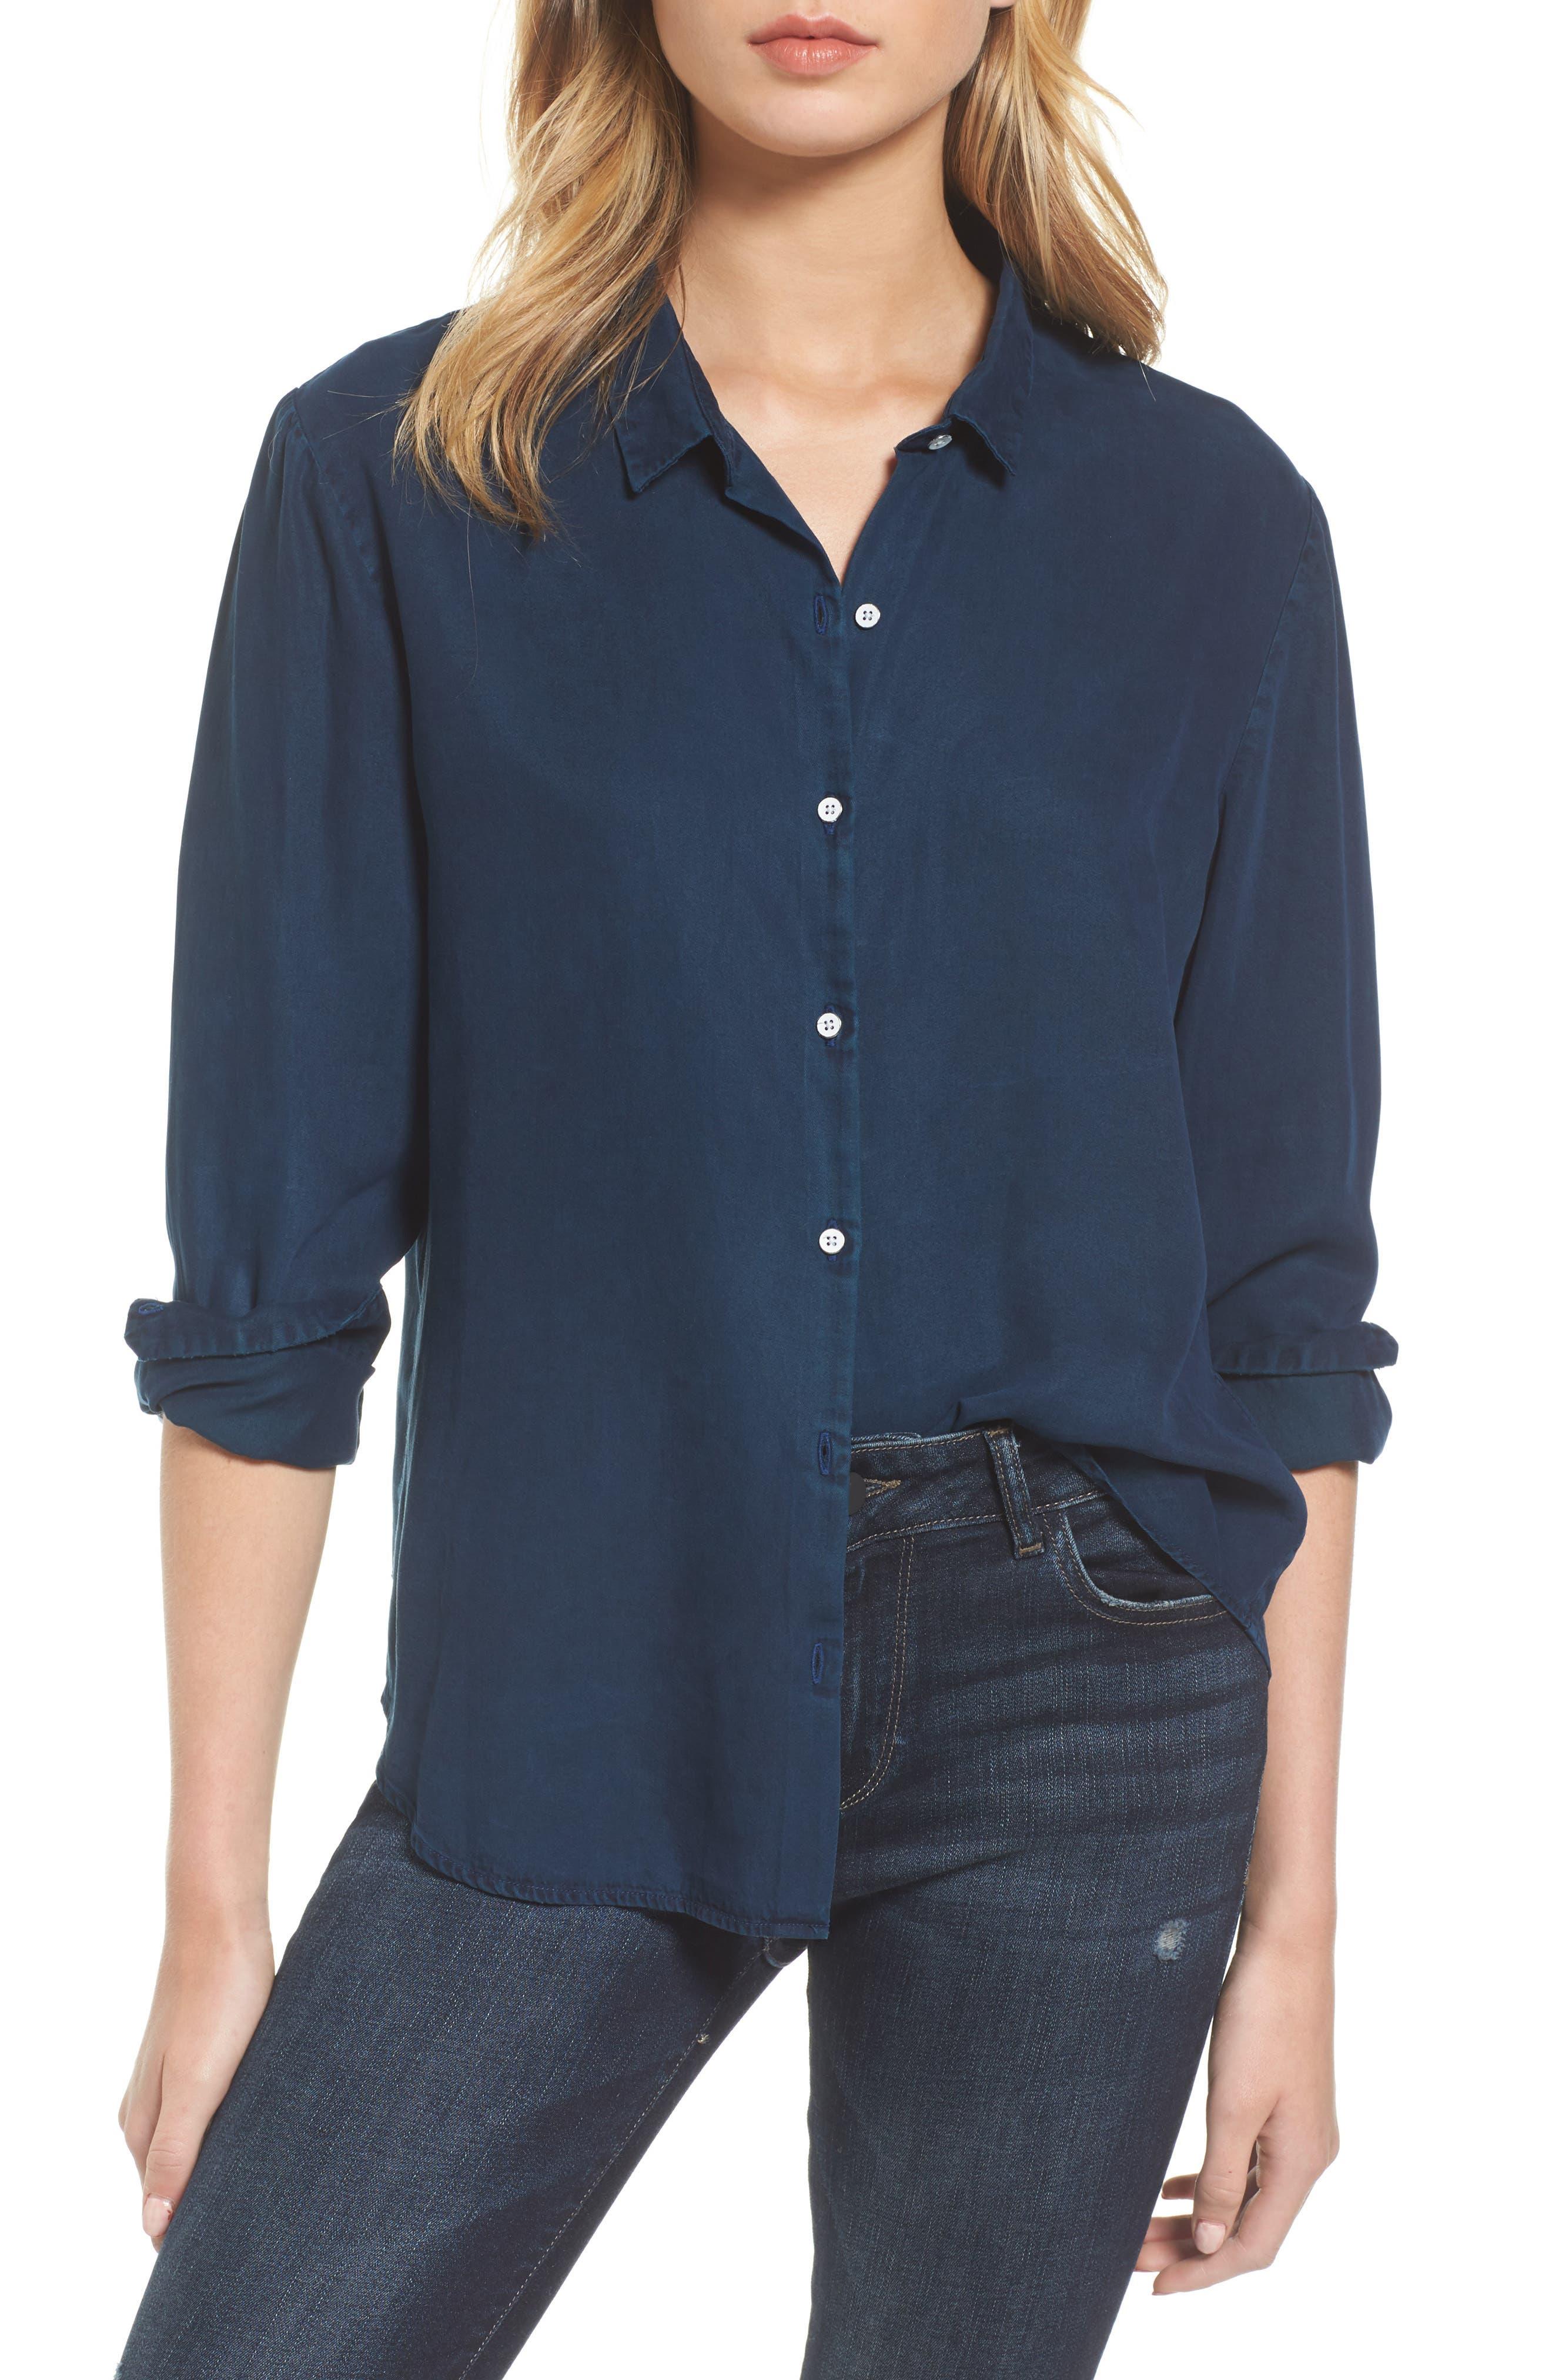 DL1961 x The Blue Shirt Shop W 4th & Jane Slim Fit Shirt